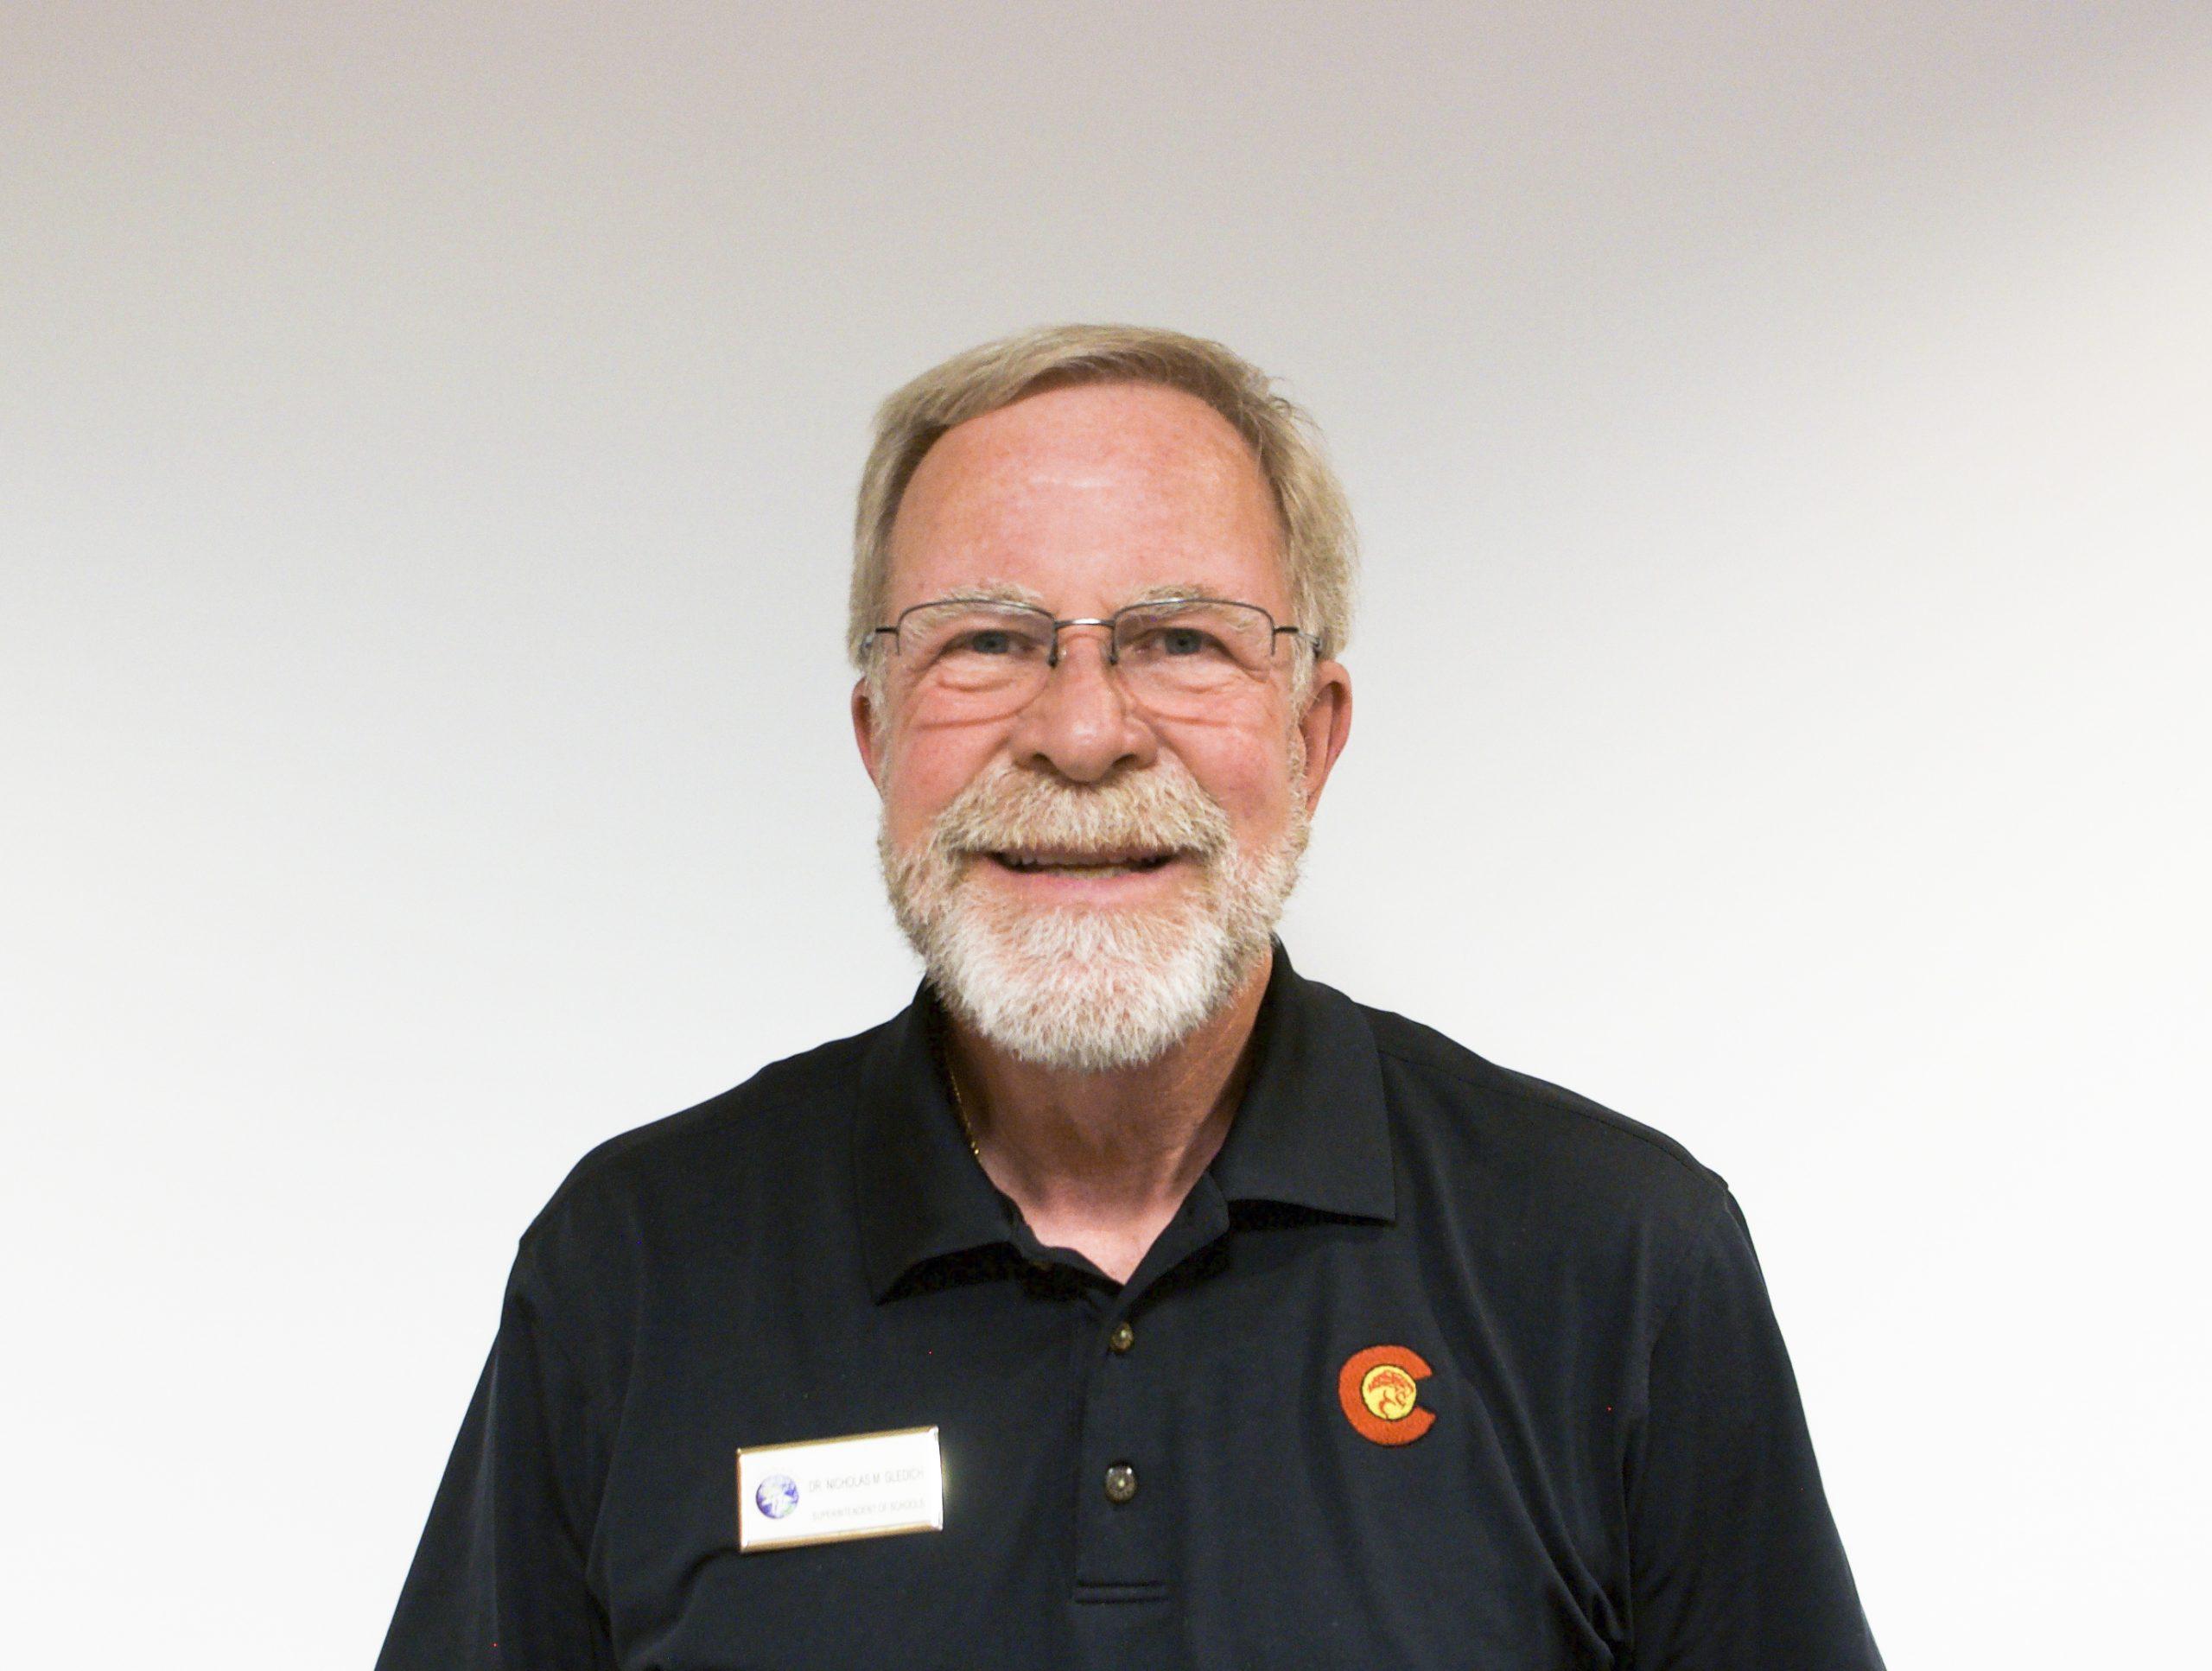 Nick Gledich, District 11 Superintendent